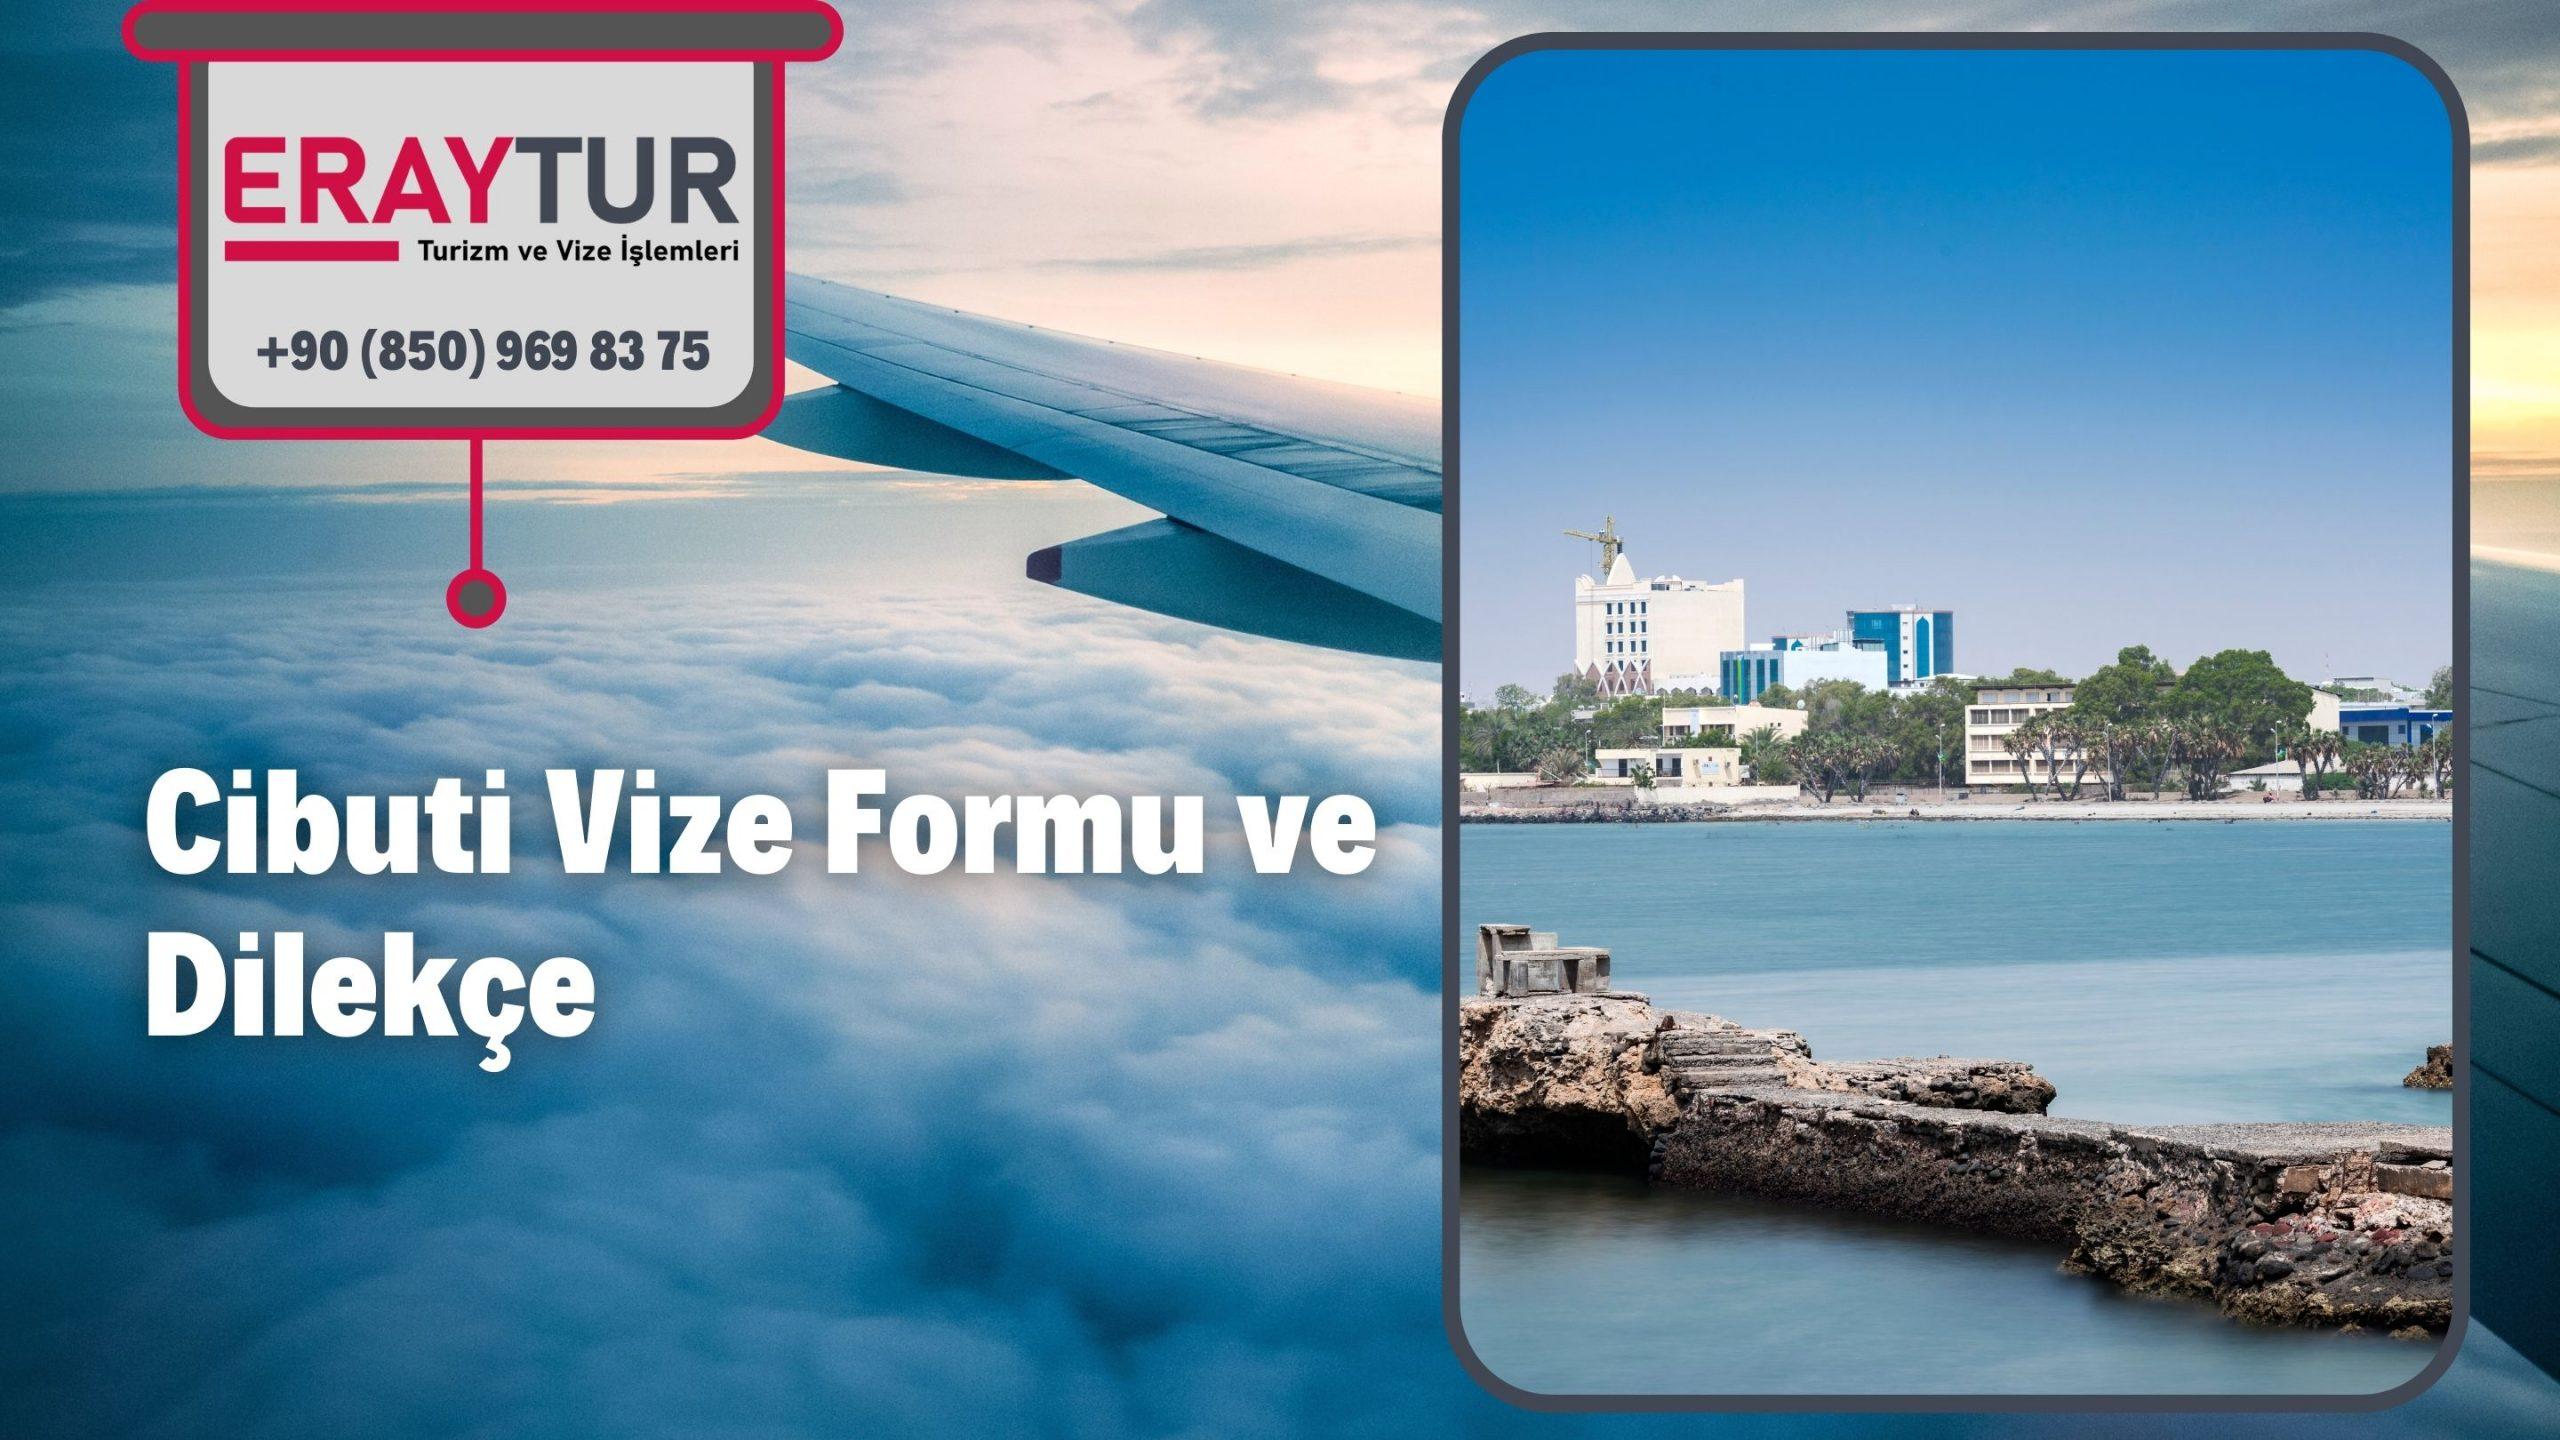 Cibuti Vize Formu ve Dilekçe 1 – cibuti vize formu ve dilekce 1 scaled